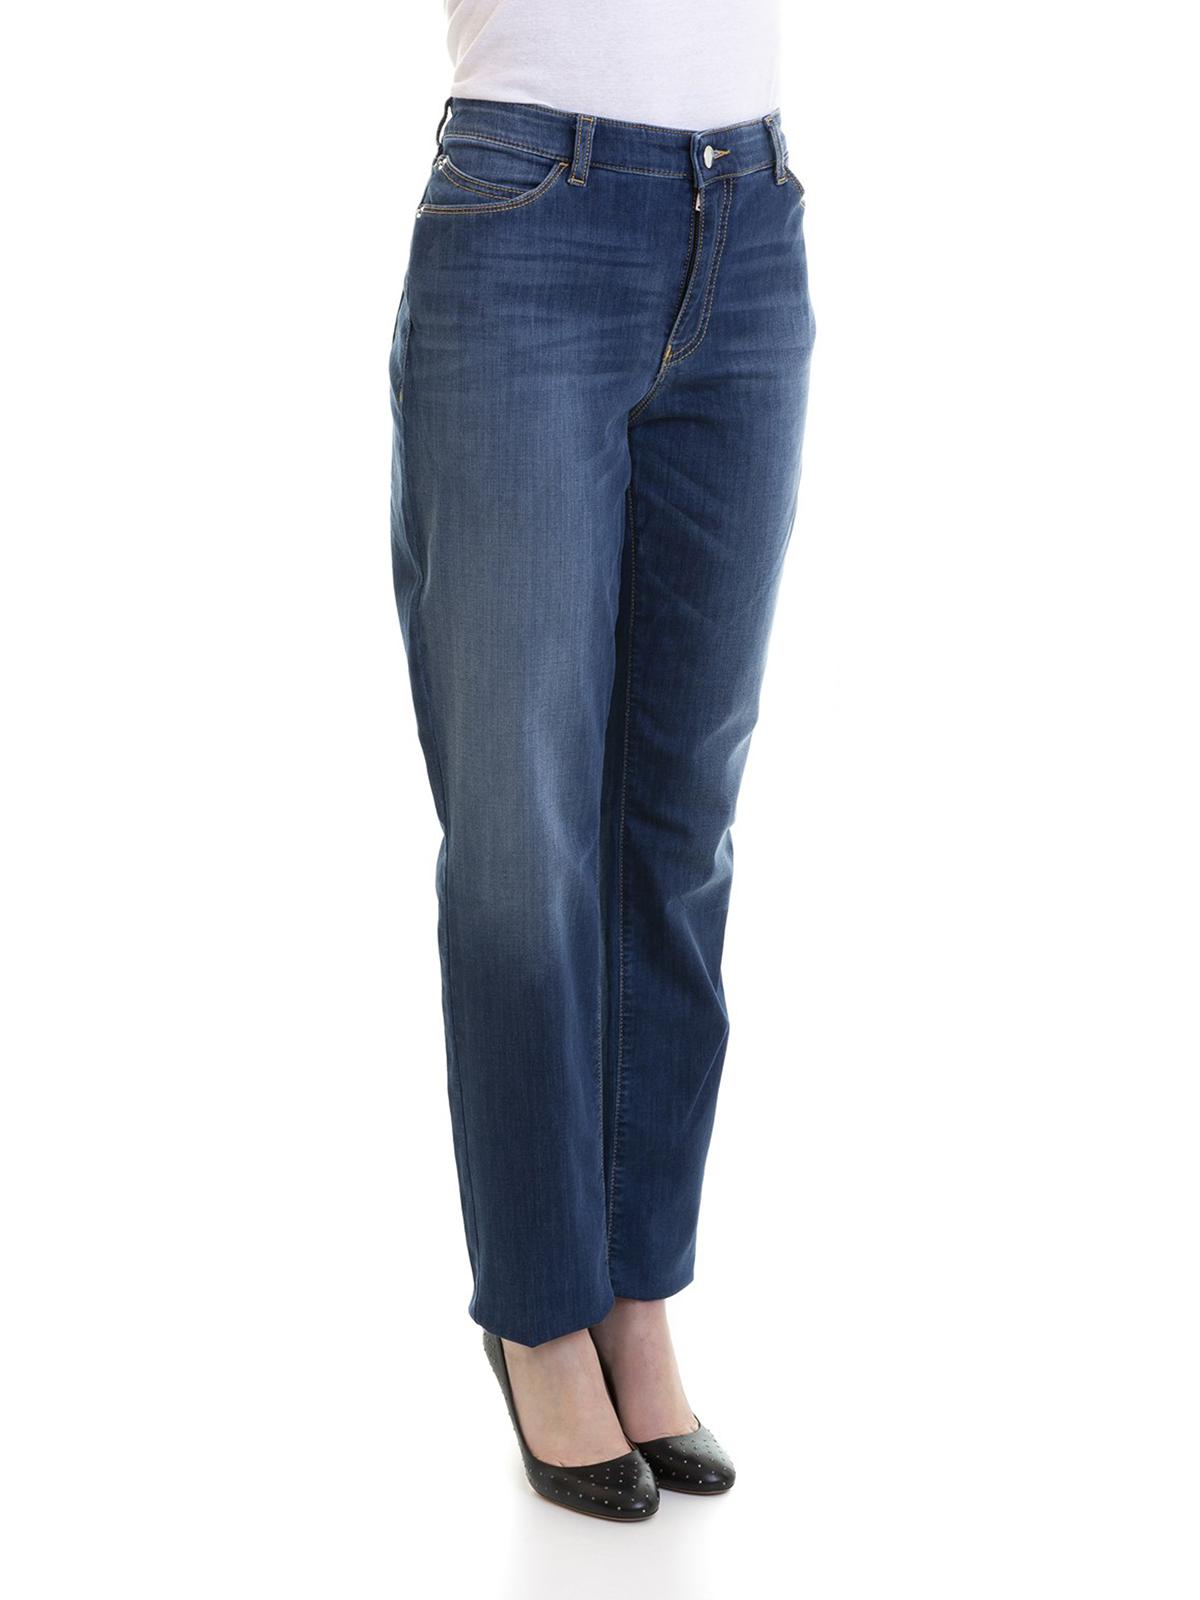 6a2dca1026 Emporio Armani - Faded stretch denim high rise jeans - straight leg ...